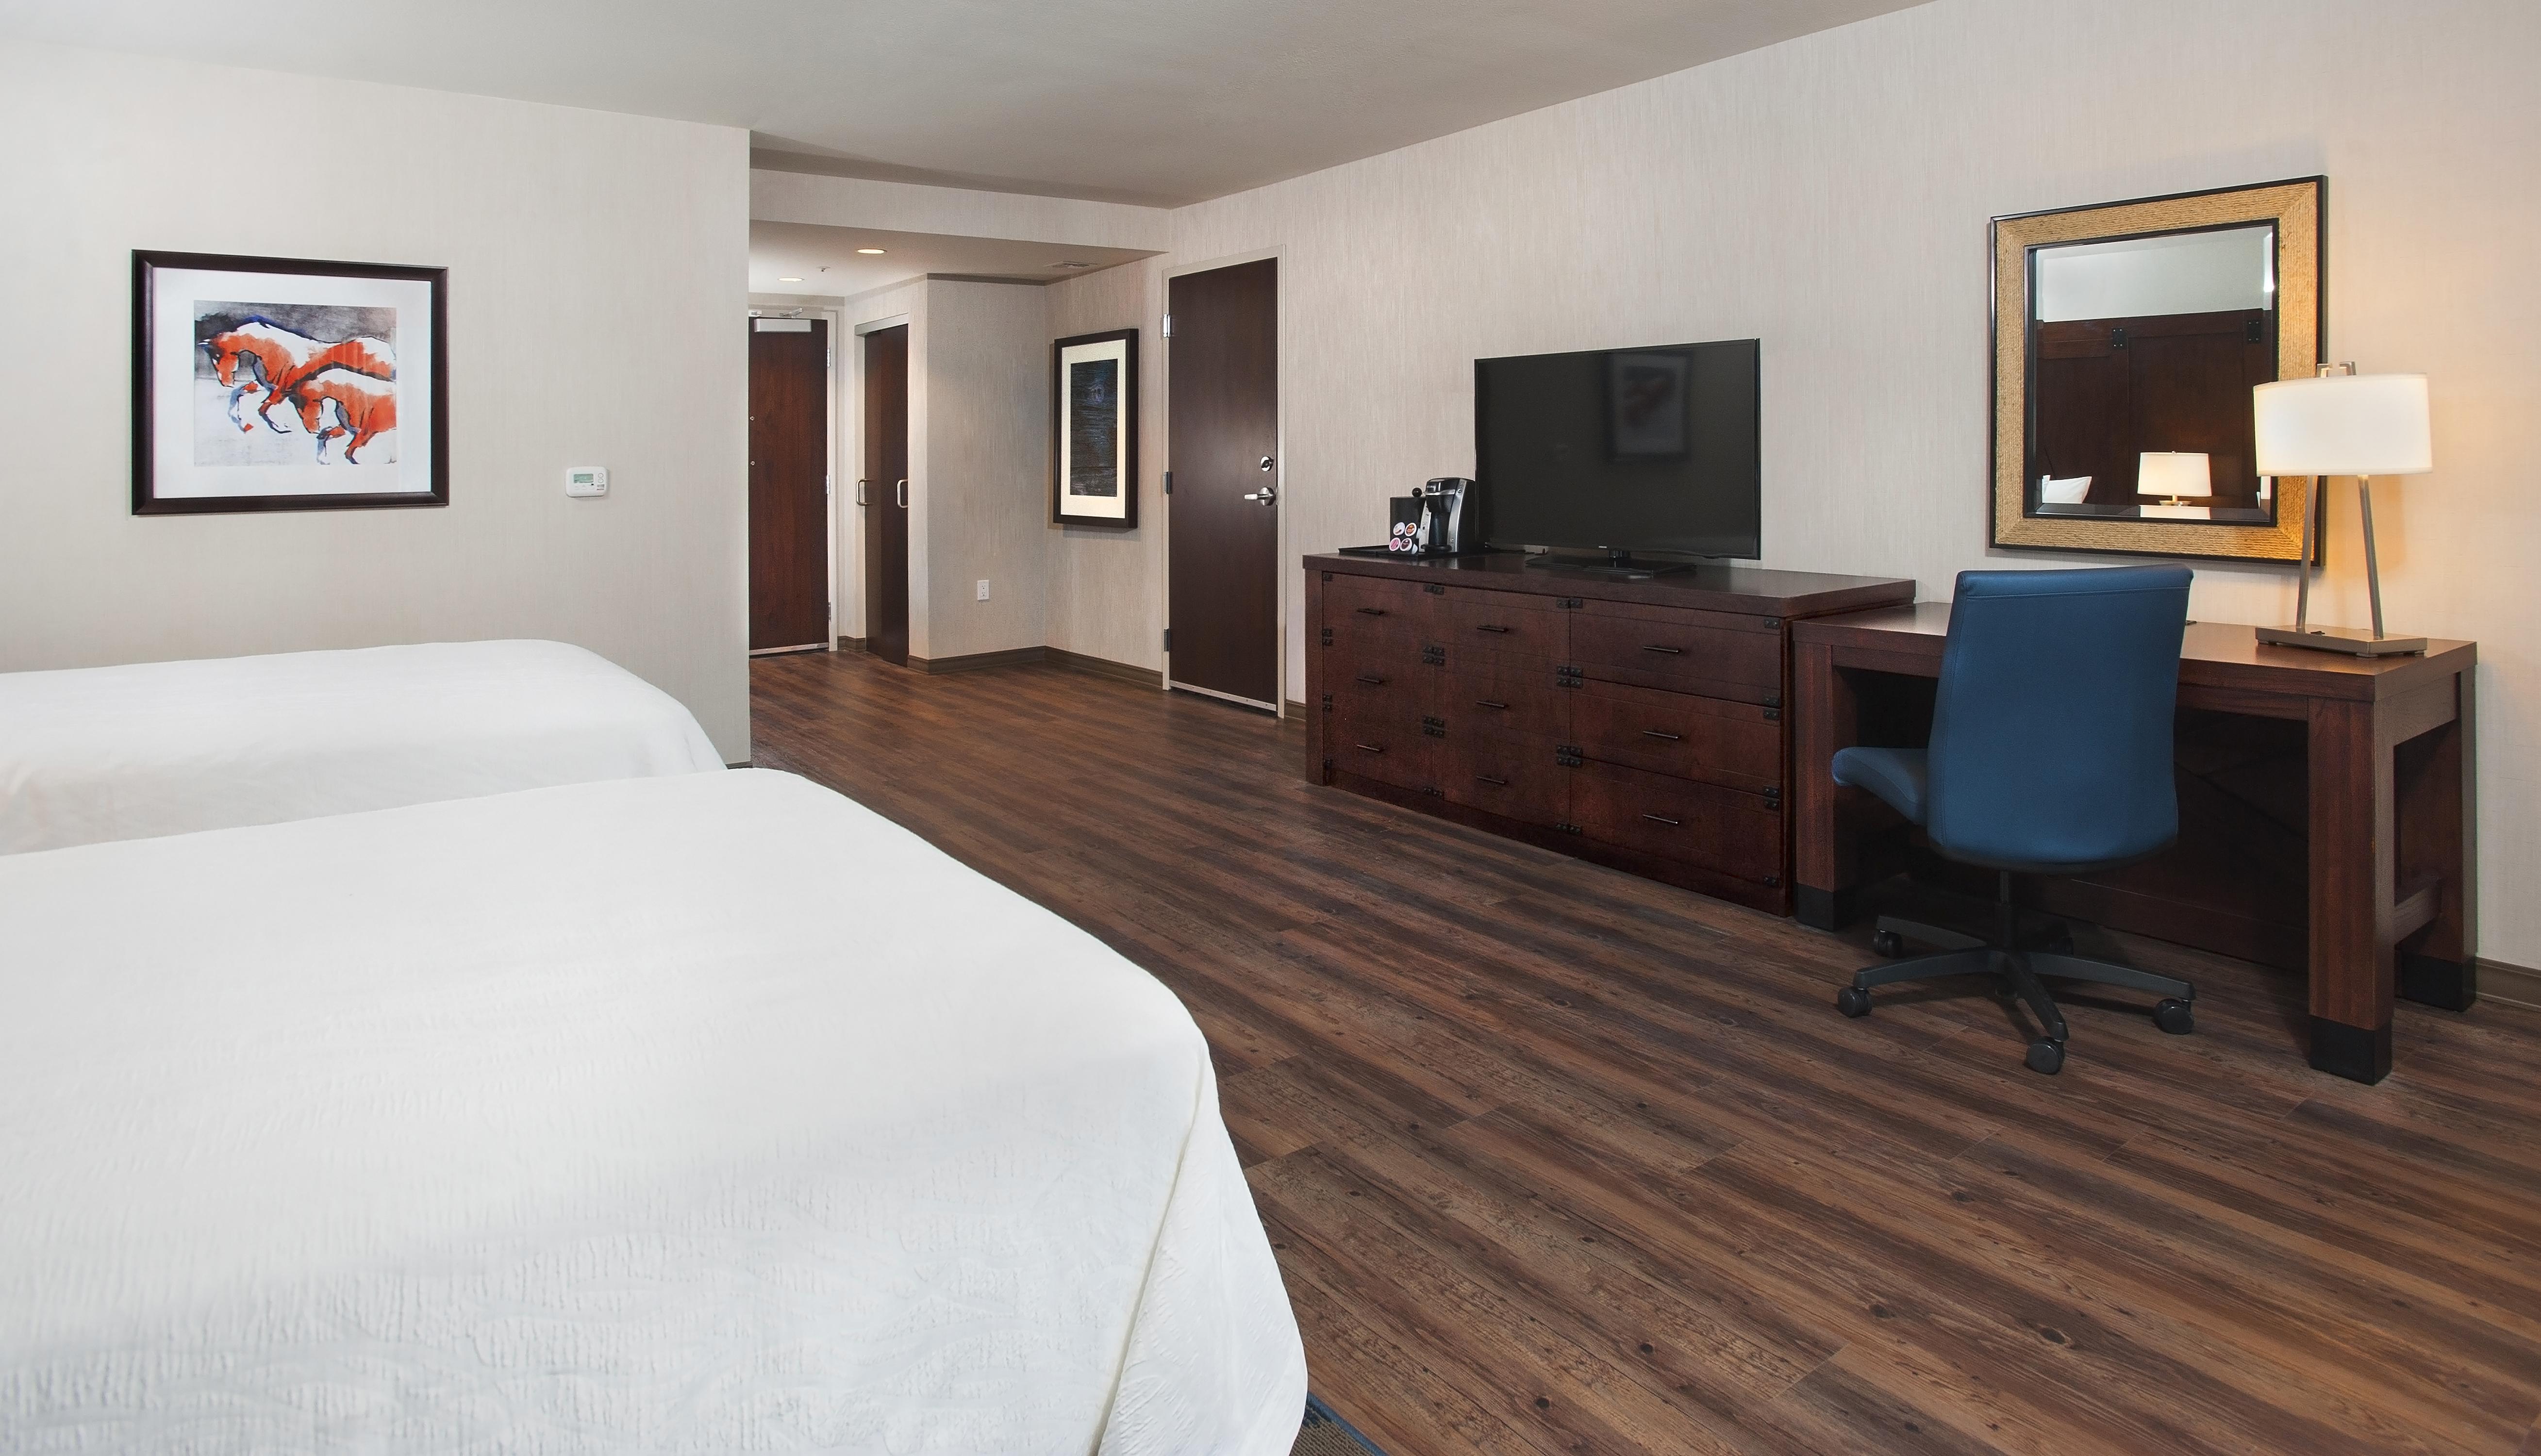 https://www.hotelsbyday.com/_data/default-hotel_image/4/21899/hilton-garden-inn-burbank-accessible-2-queen-2.jpg